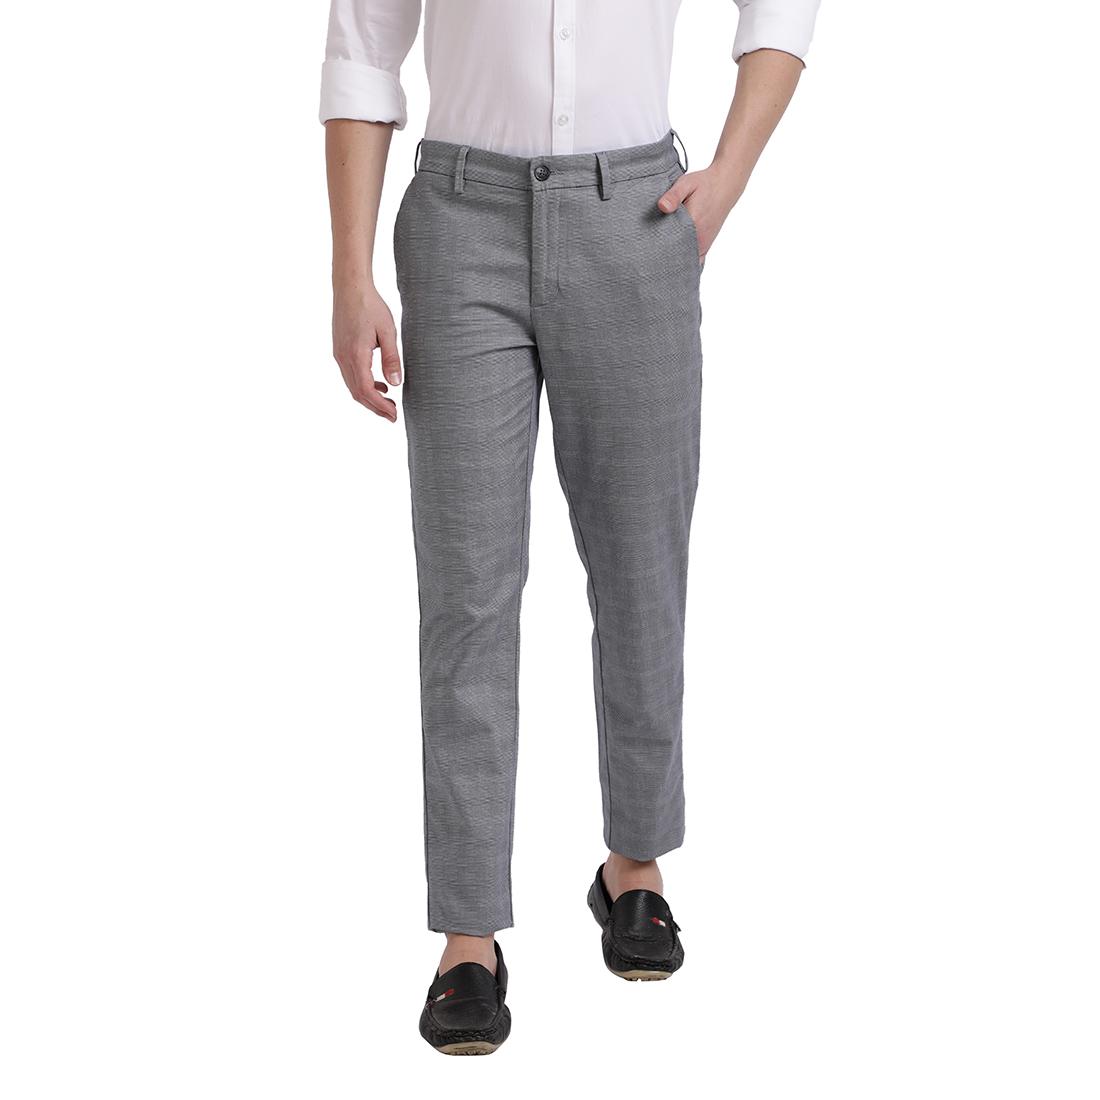 ColorPlus | ColorPlus Grey Trouser